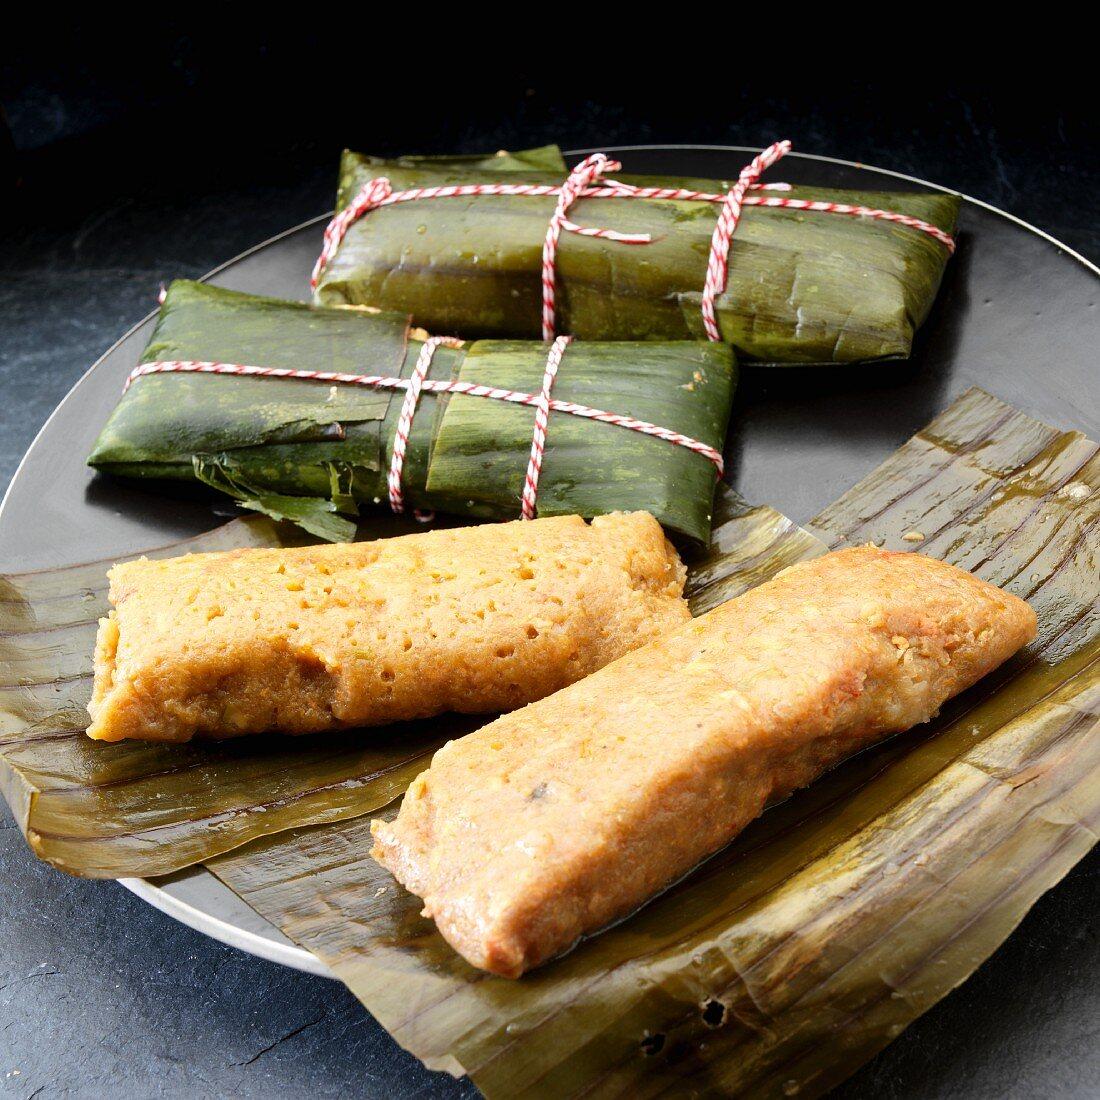 Pastele de Masa, pork pasteles. shredded pork and vegetables in banana leaf